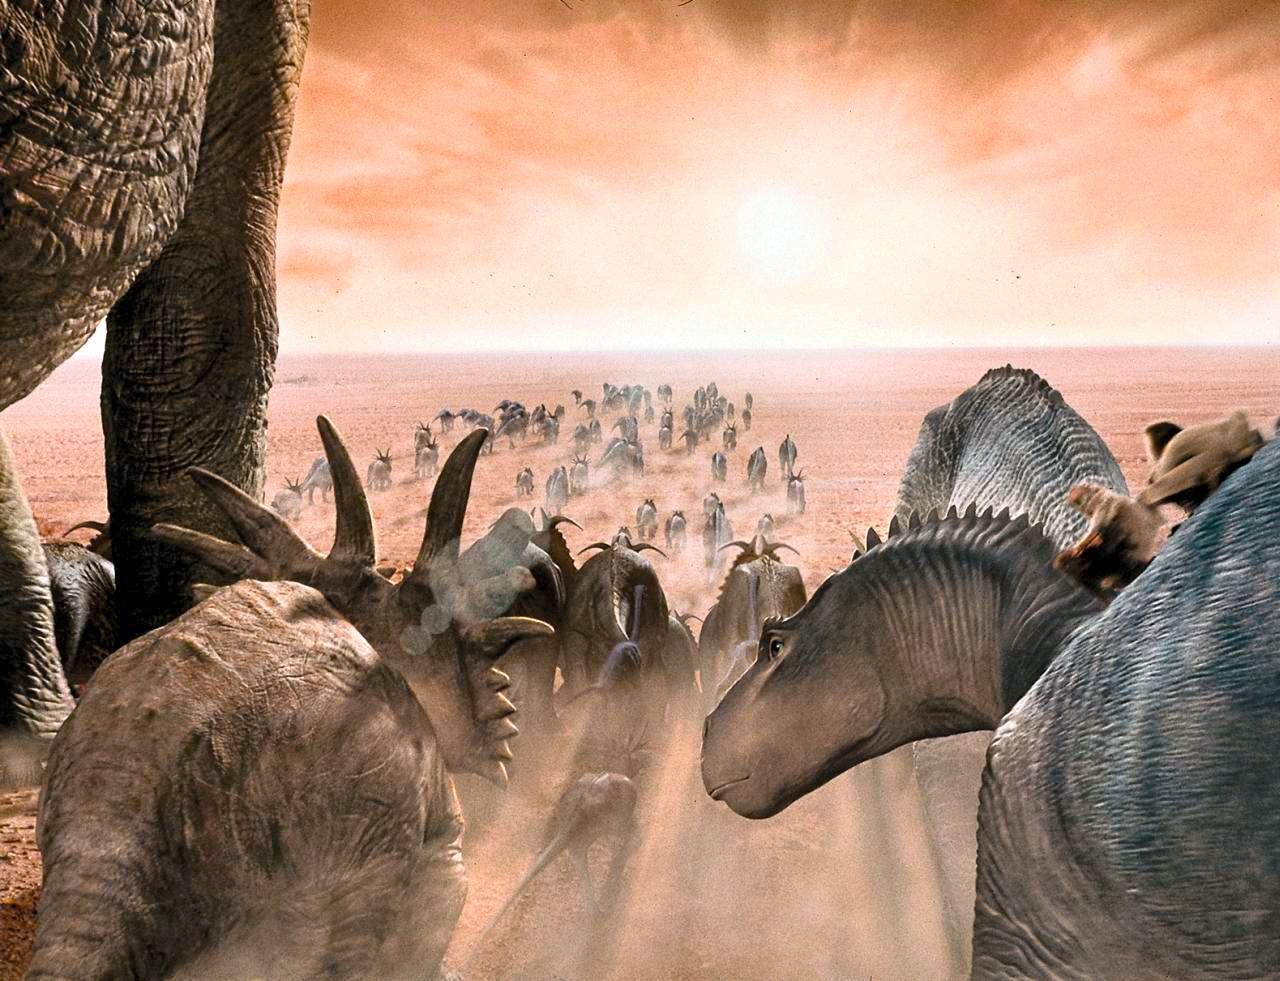 Long ago, on an untouched Earth, giant lizard-like animals walked ... | 1280 x 981 jpeg 218kB